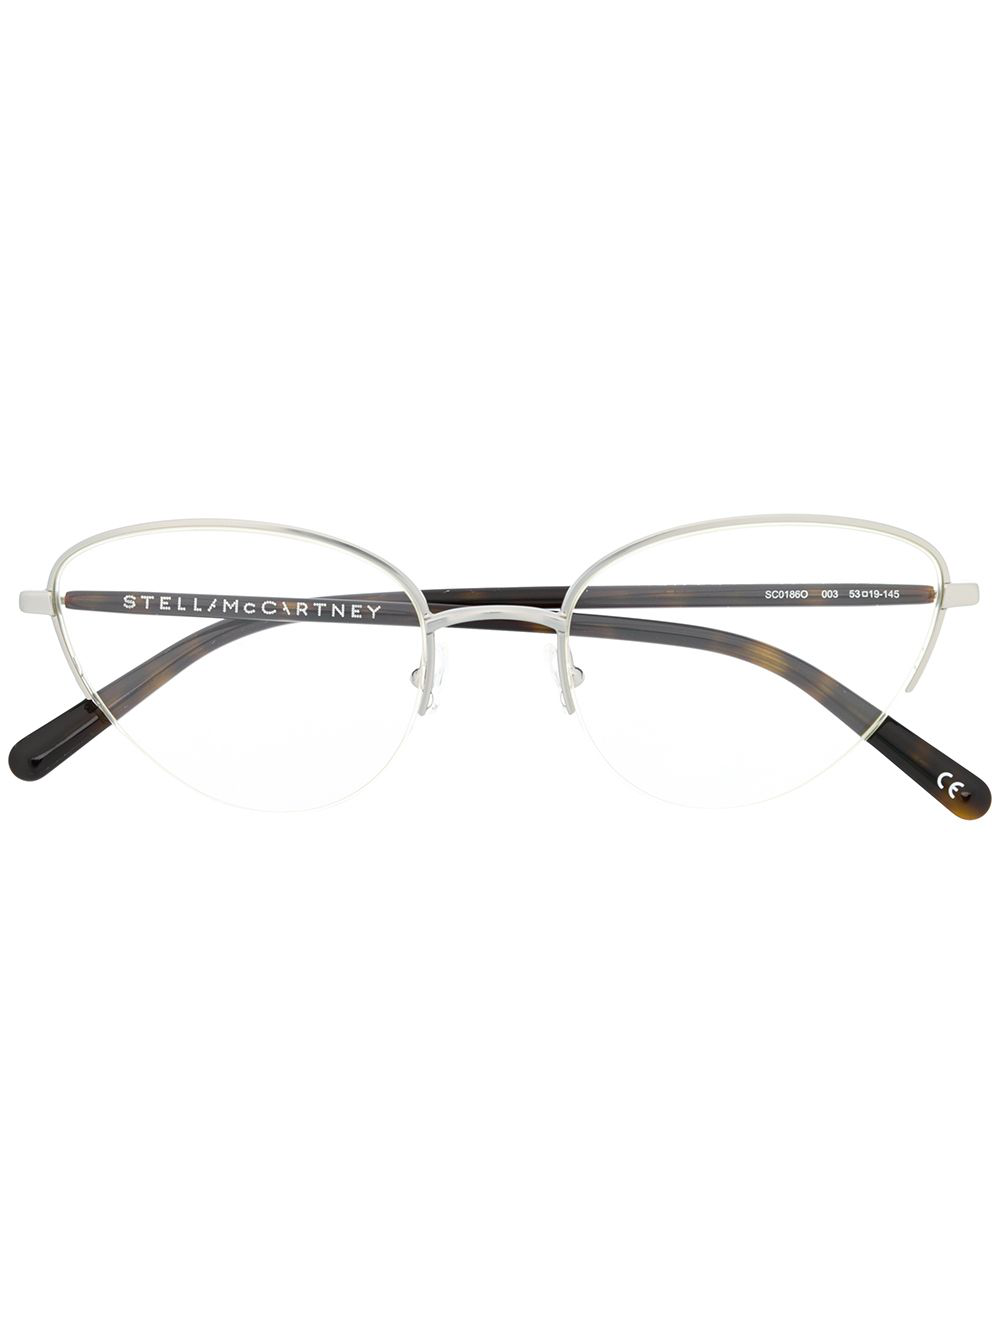 73d80e375265c Stella Mccartney Eyewear Cat Eye Frame Glasses - Brown